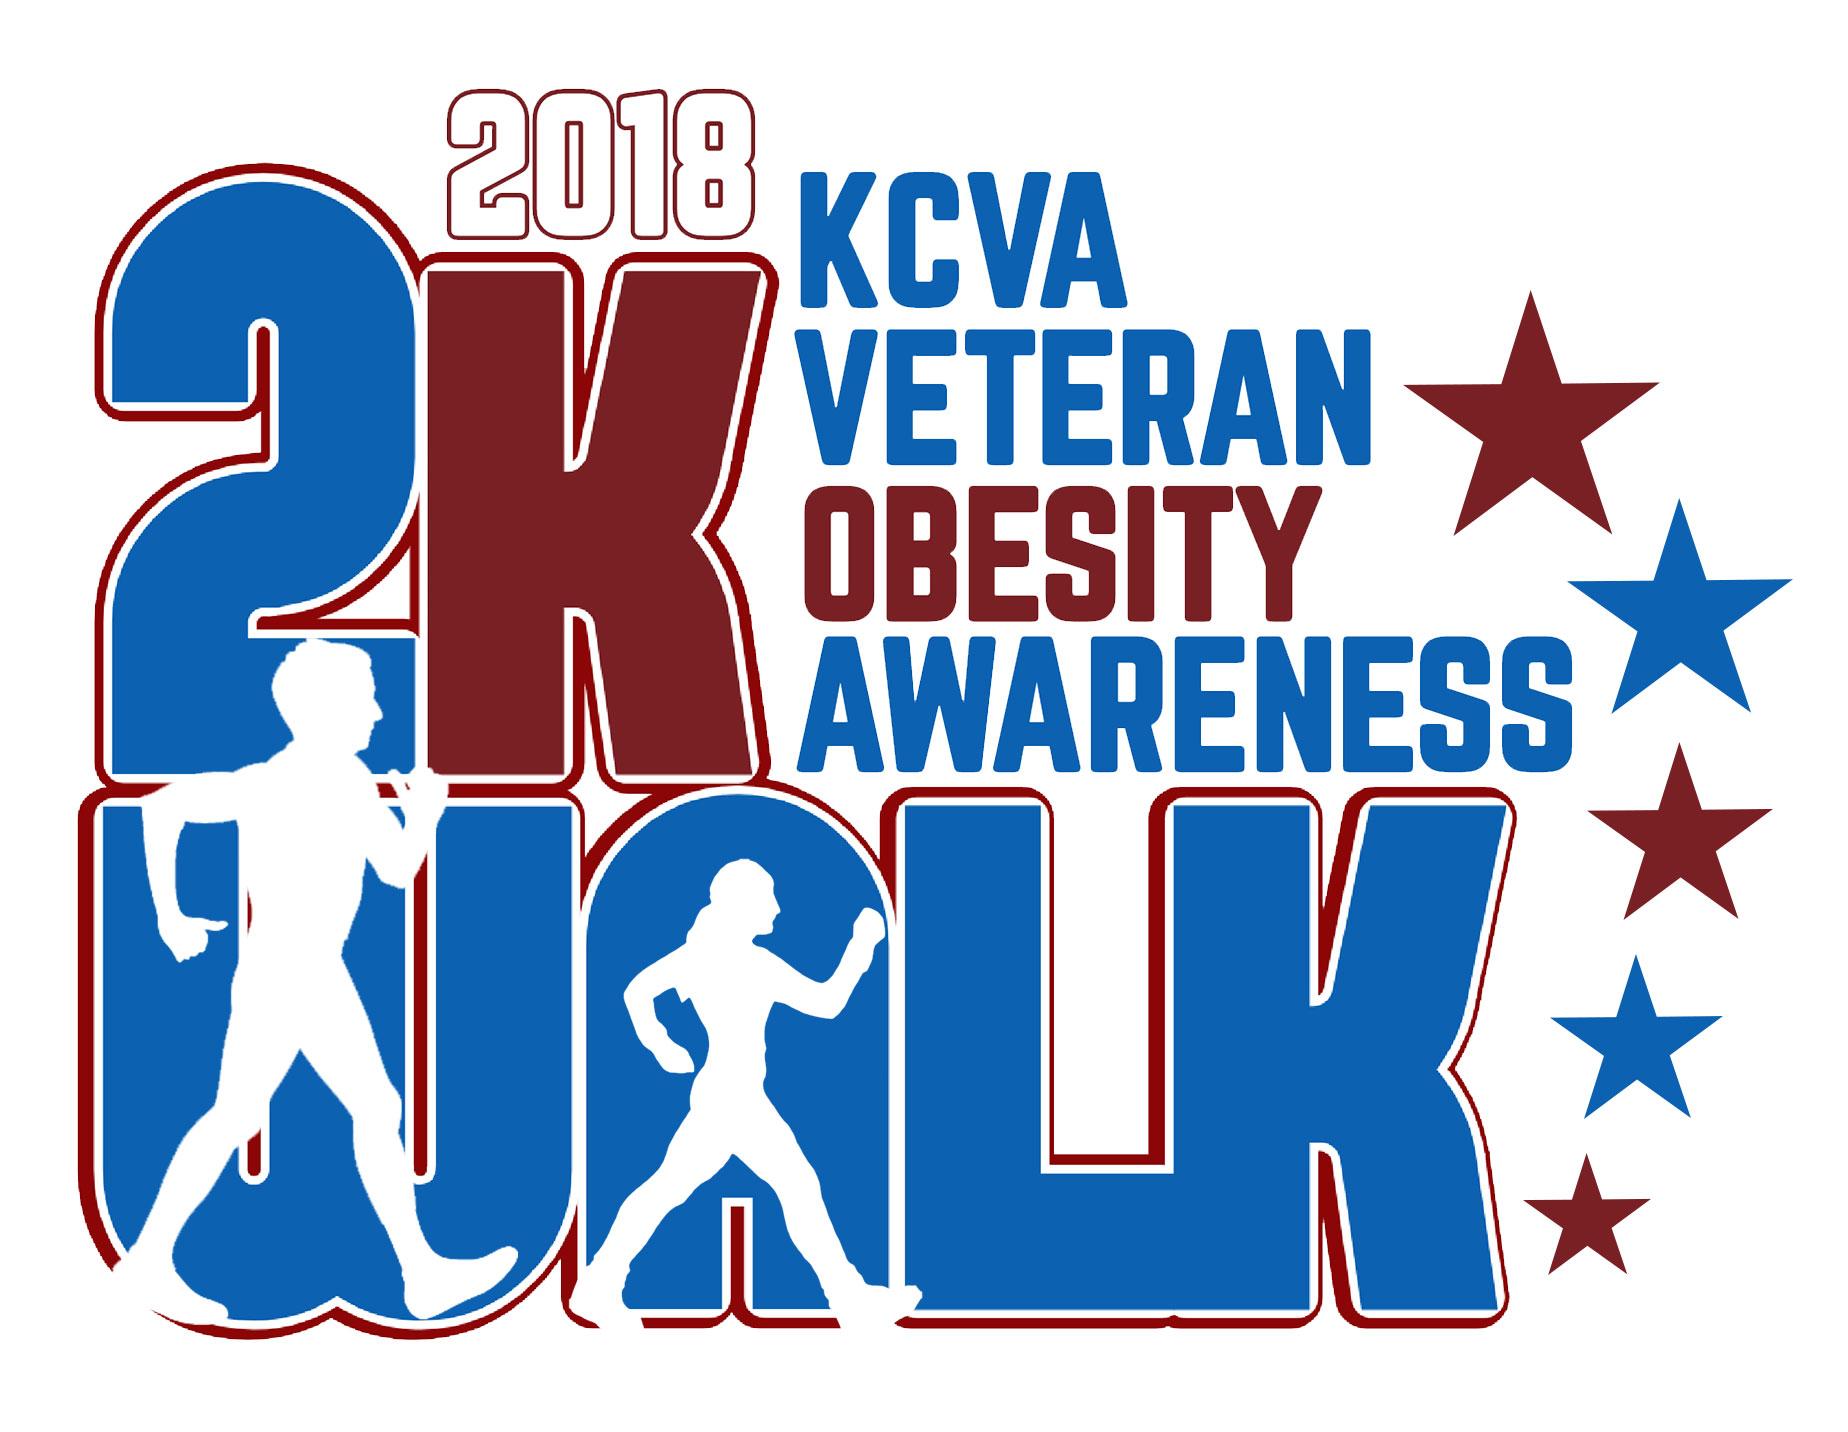 2k medical centre clipart banner transparent Veteran Obesity Awareness 2k Walk - Kansas City VA Medical Center banner transparent